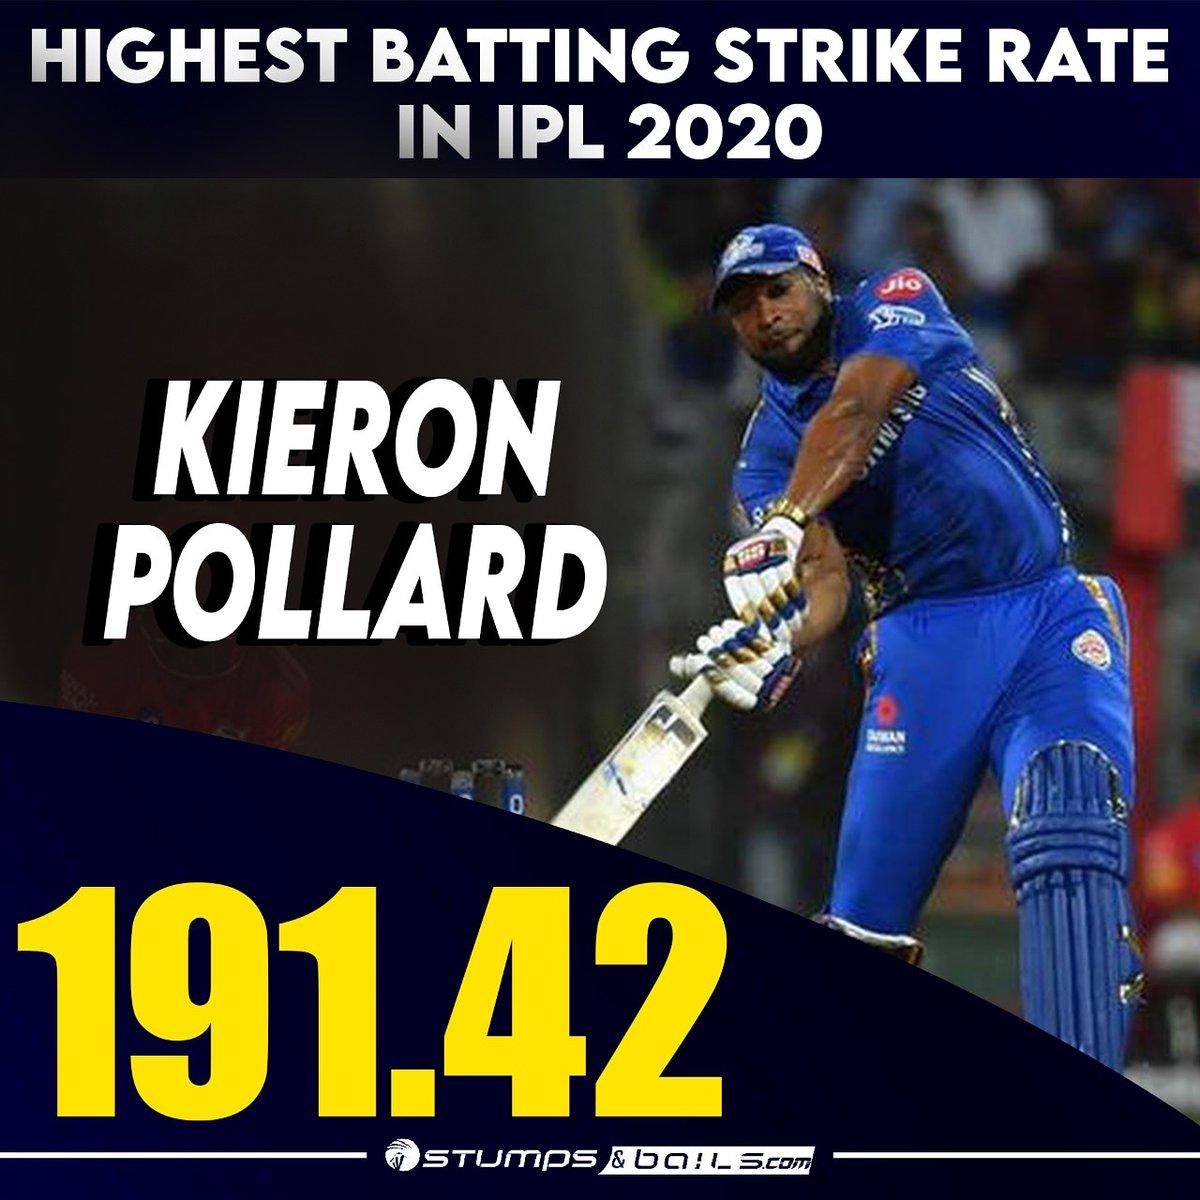 Highest SR in #IPL2020 🤩🥳 @KieronPollard55  Follow us @stumpnbails #IPL2020finals #IPLinUAE #IPLFinals #dream11iplfinal #Dream11IPL2020 #MI #DC #MIvsDC #DCvMI #MumbaiIndians #DelhiCapitals #RohitSharma #KieronPollard